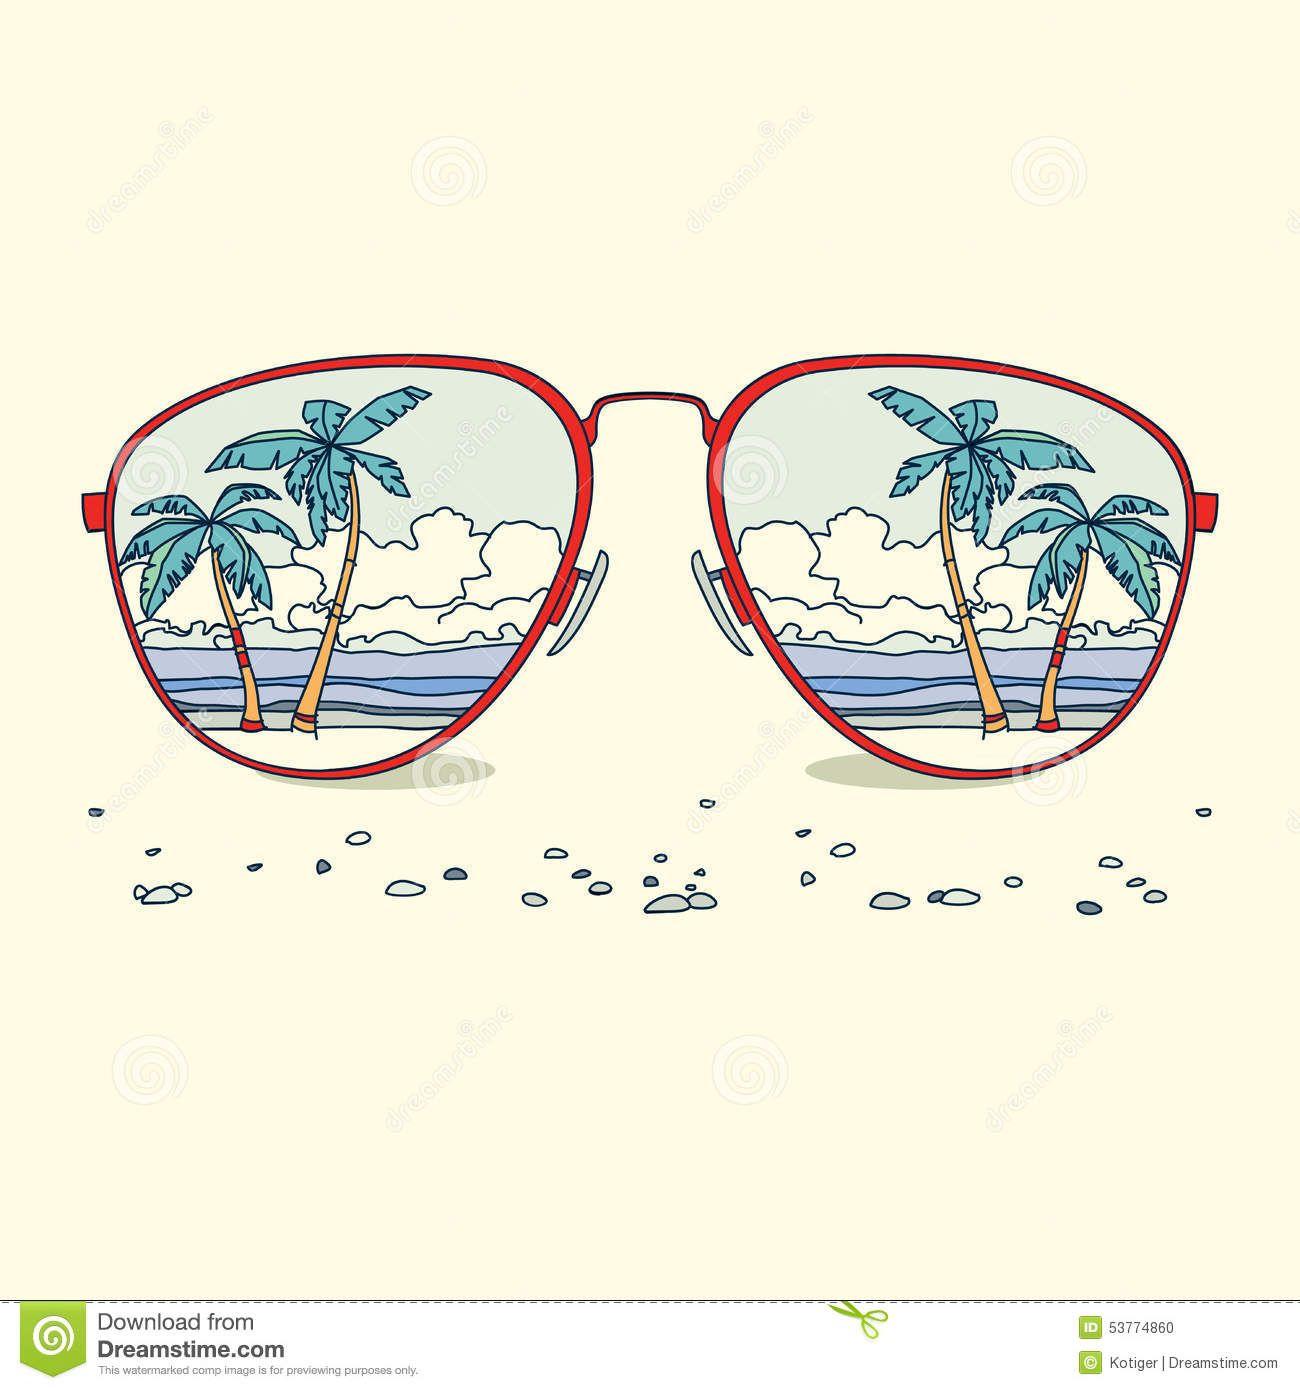 a913cc3a9e1c Reflection of the beach